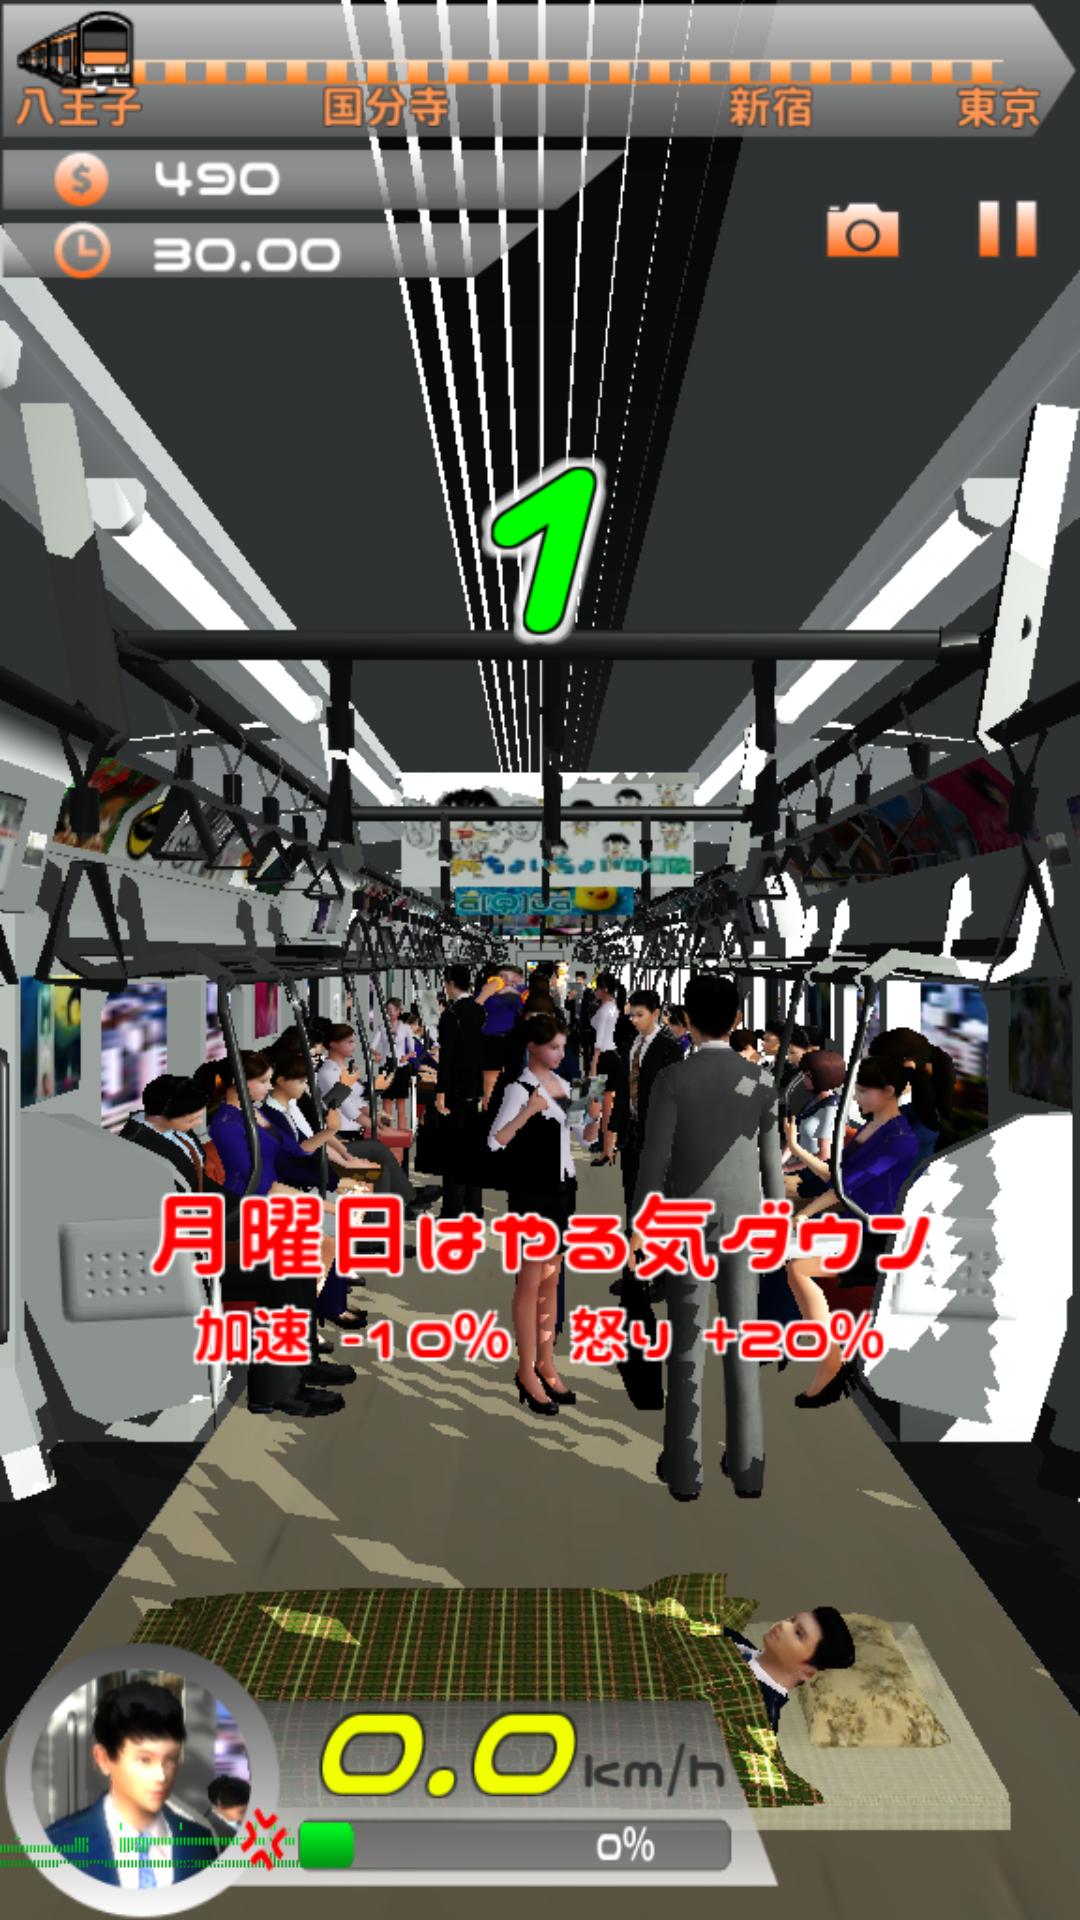 androidアプリ 30秒で通勤する方法〜八王子から東京駅まで〜攻略スクリーンショット2